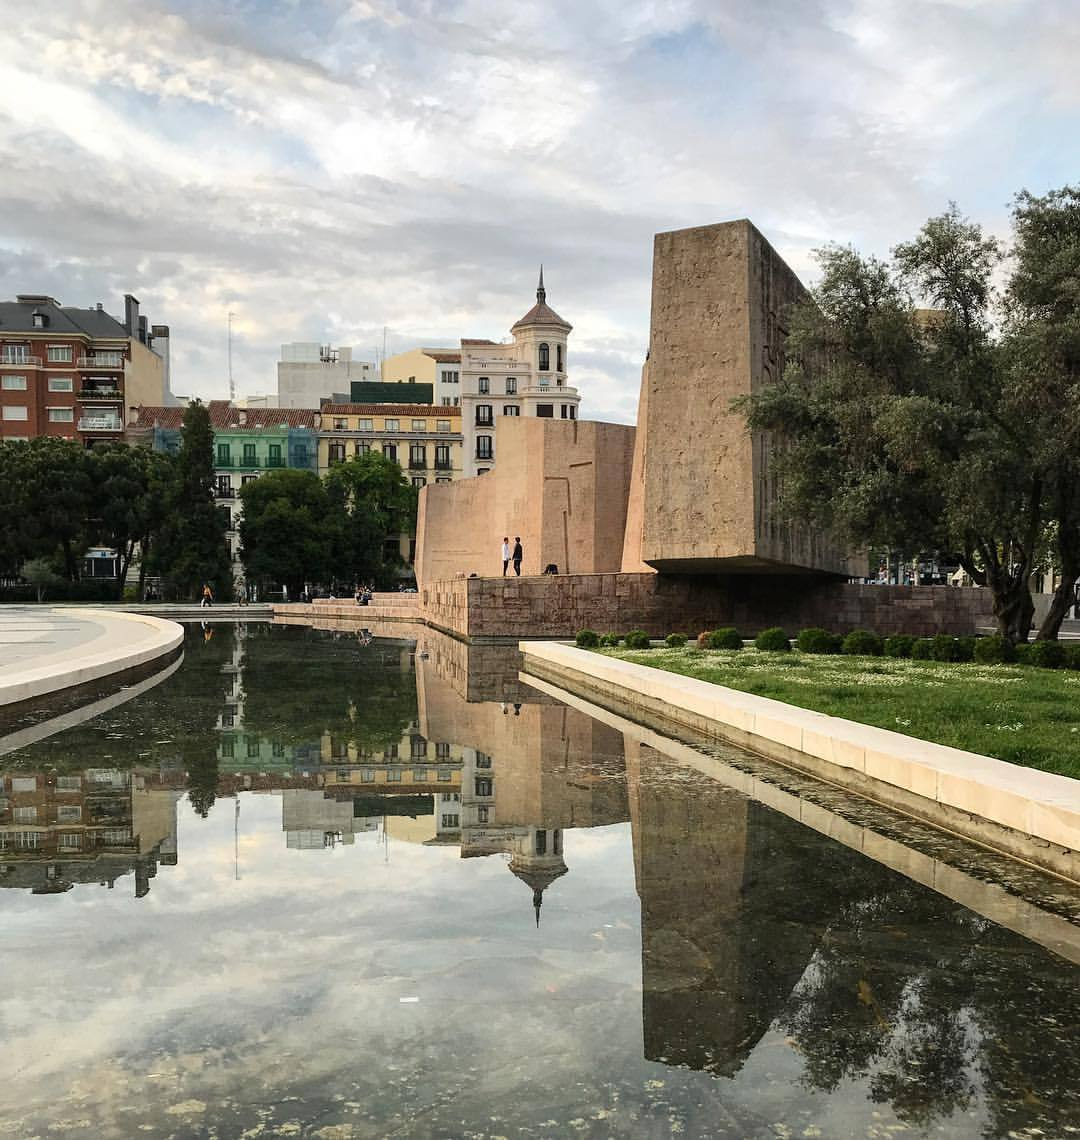 An amble in the park.  -  #spain #madrid #publicpark #citylife (at Madrid, Spain)